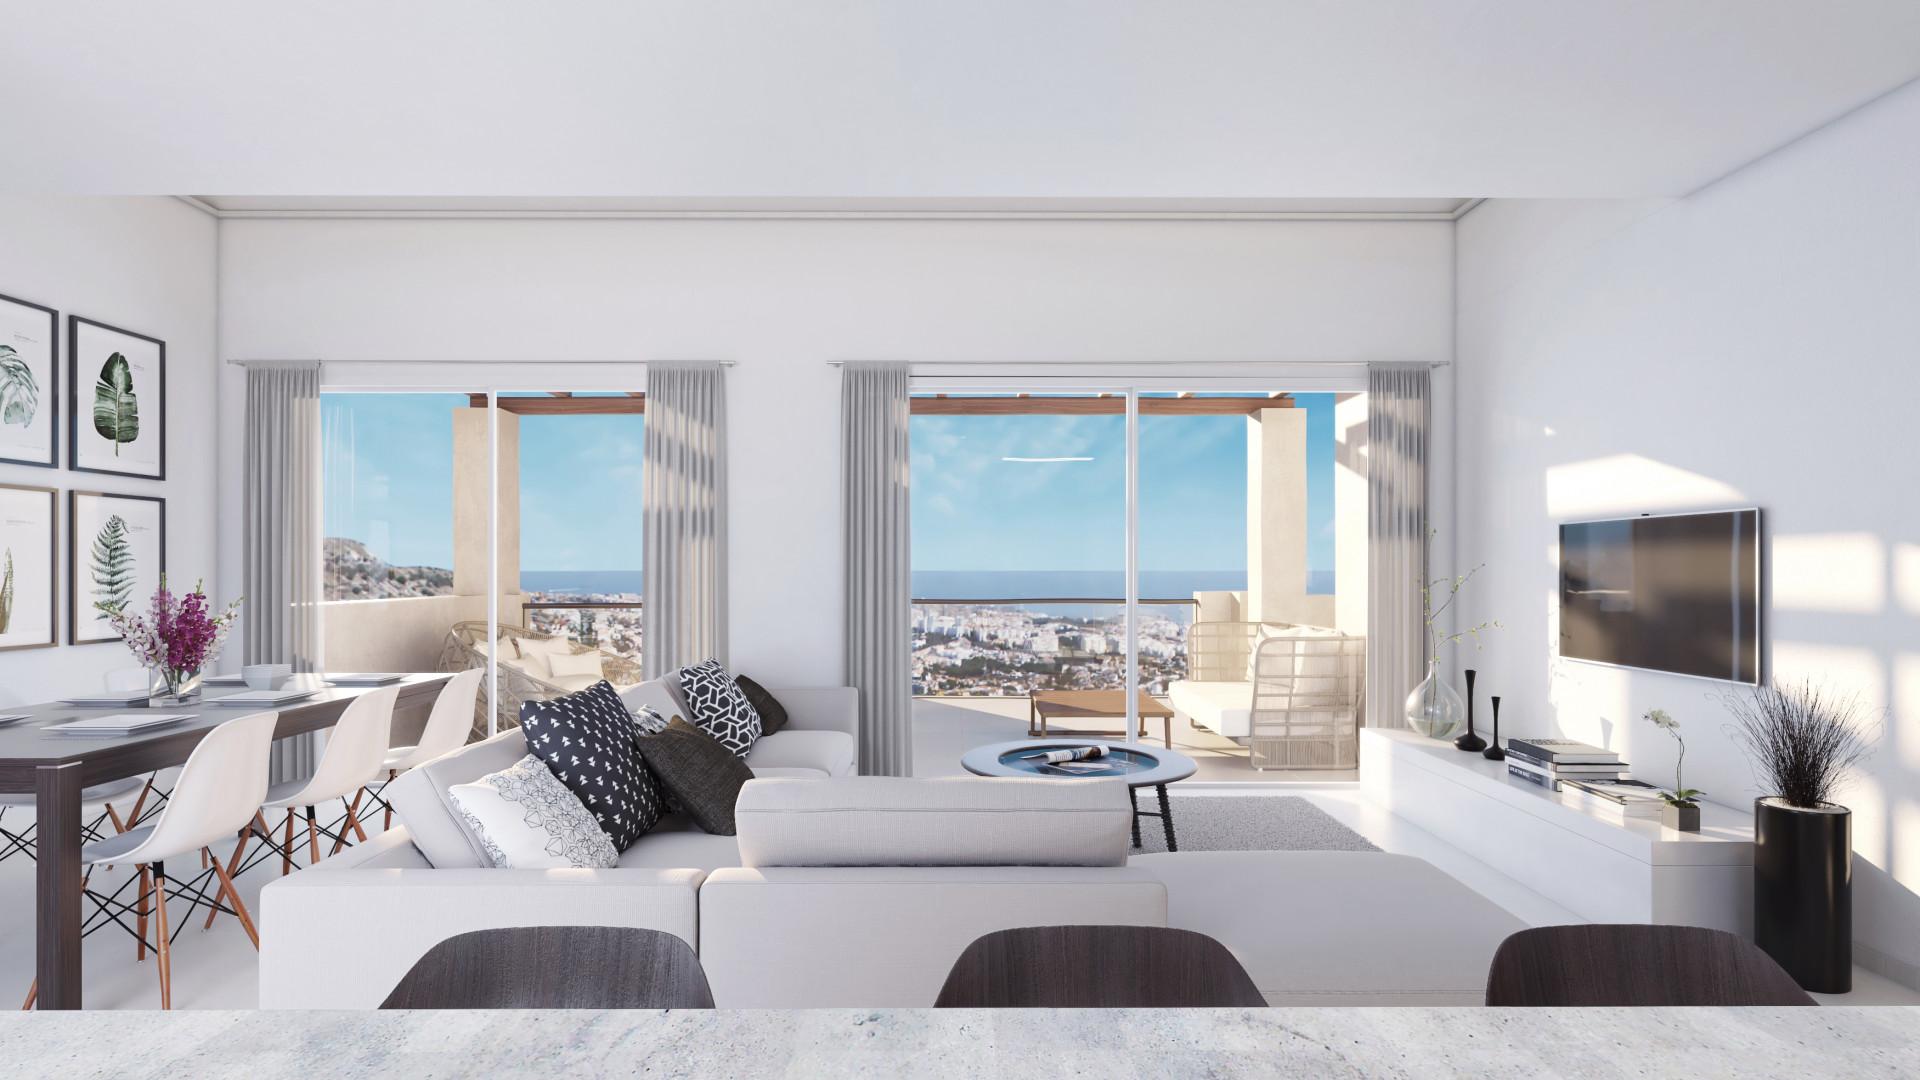 Brand new modern Mediterranean apartments for sale in Benalmadena